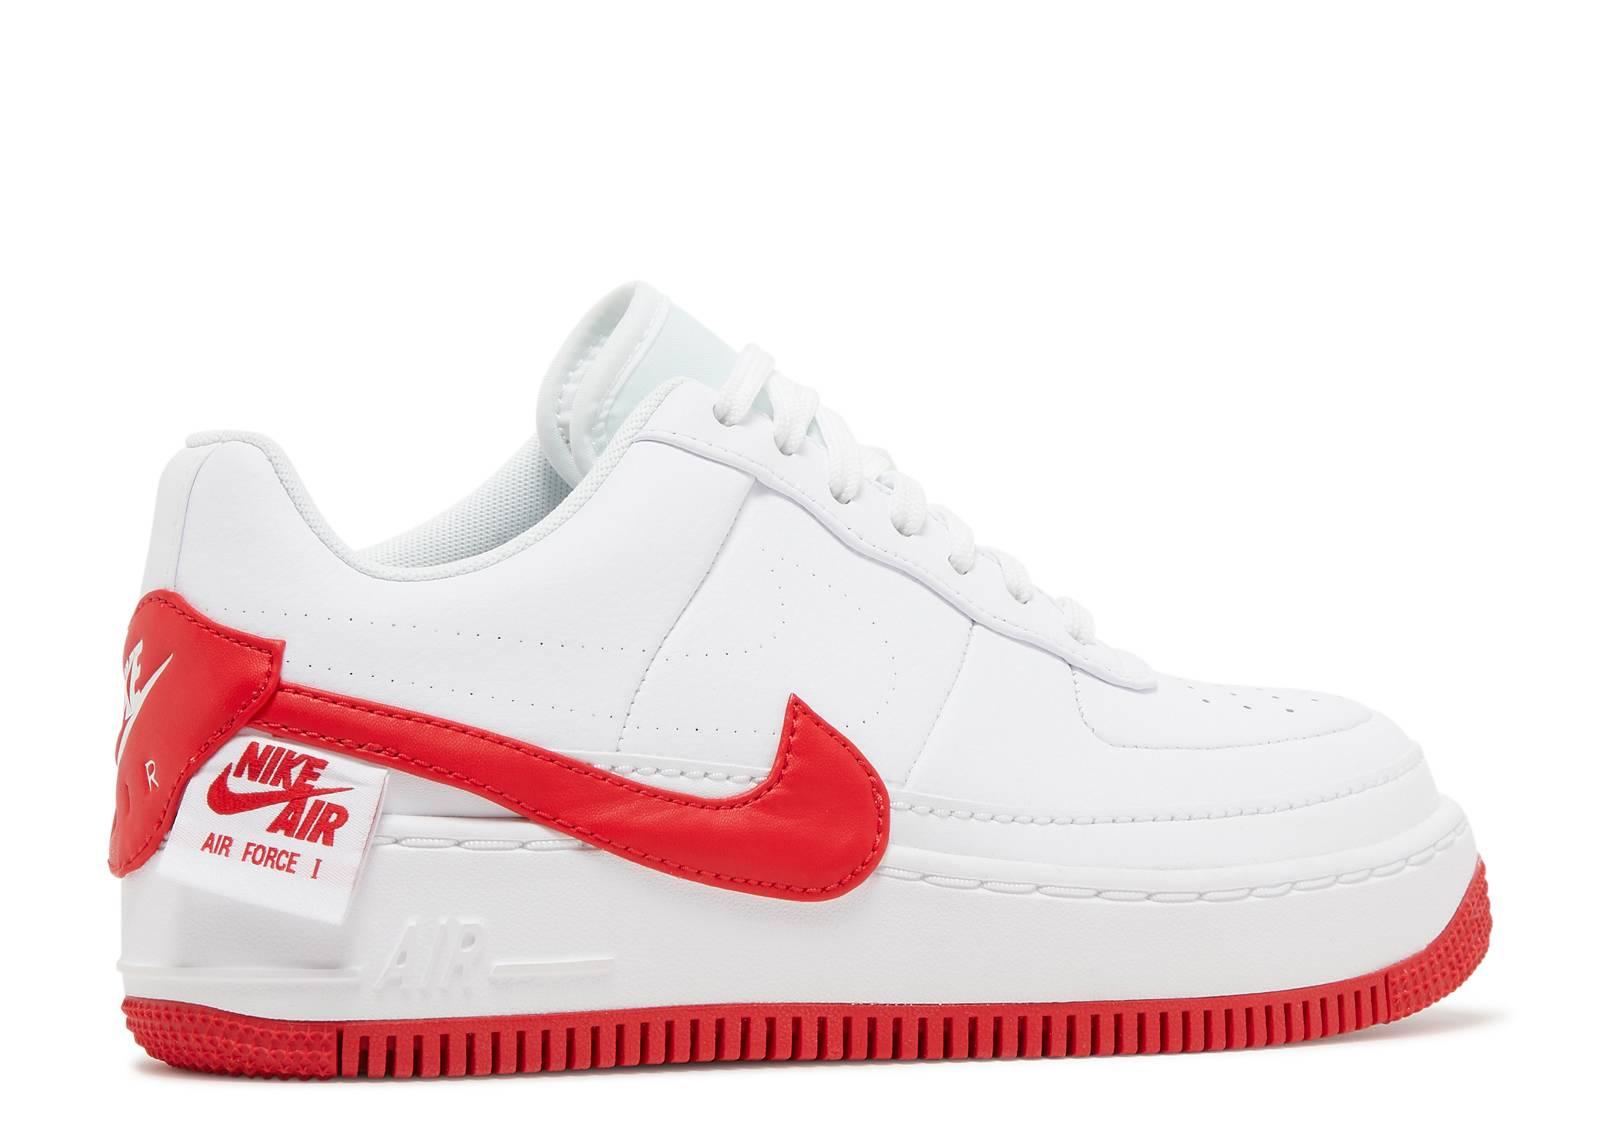 W Af1 Jester Xx - Nike - ao1220 106 - white university red  71e3c3ccc